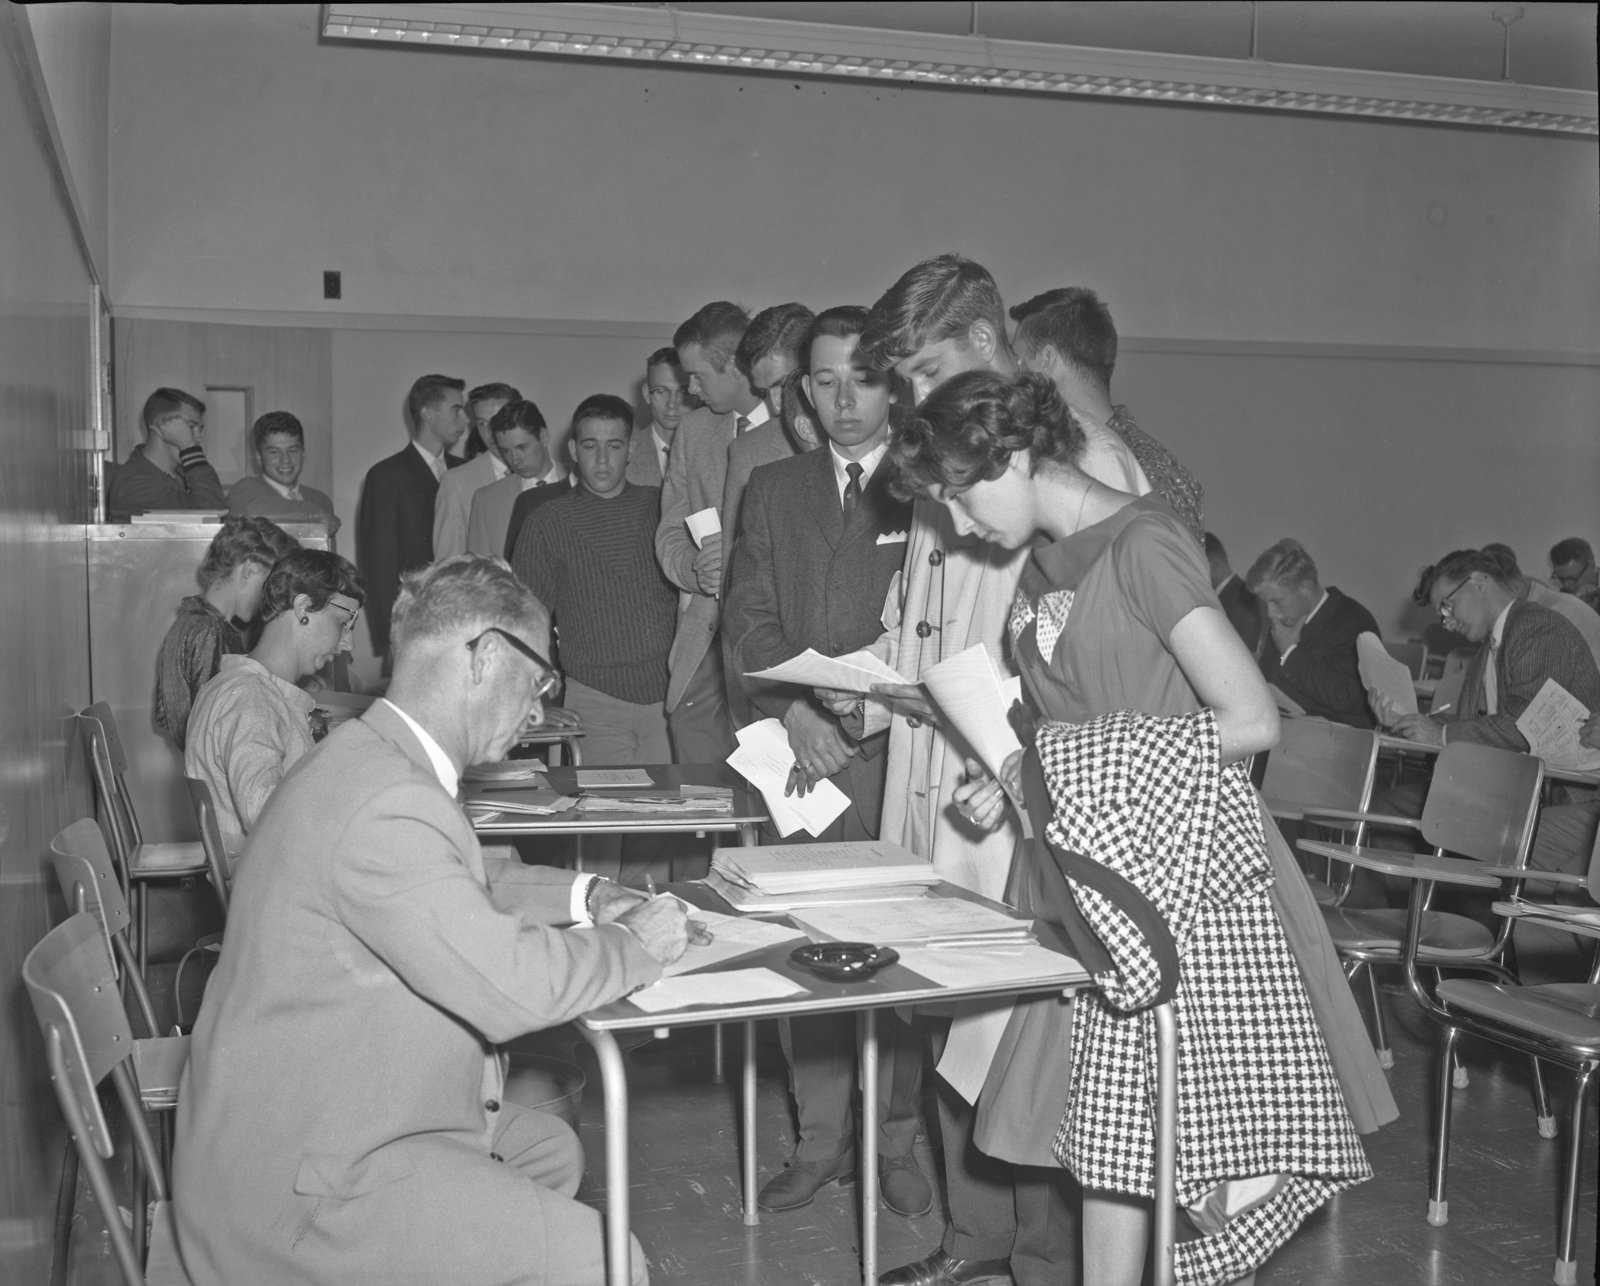 Waterloo Lutheran University registration, 1960